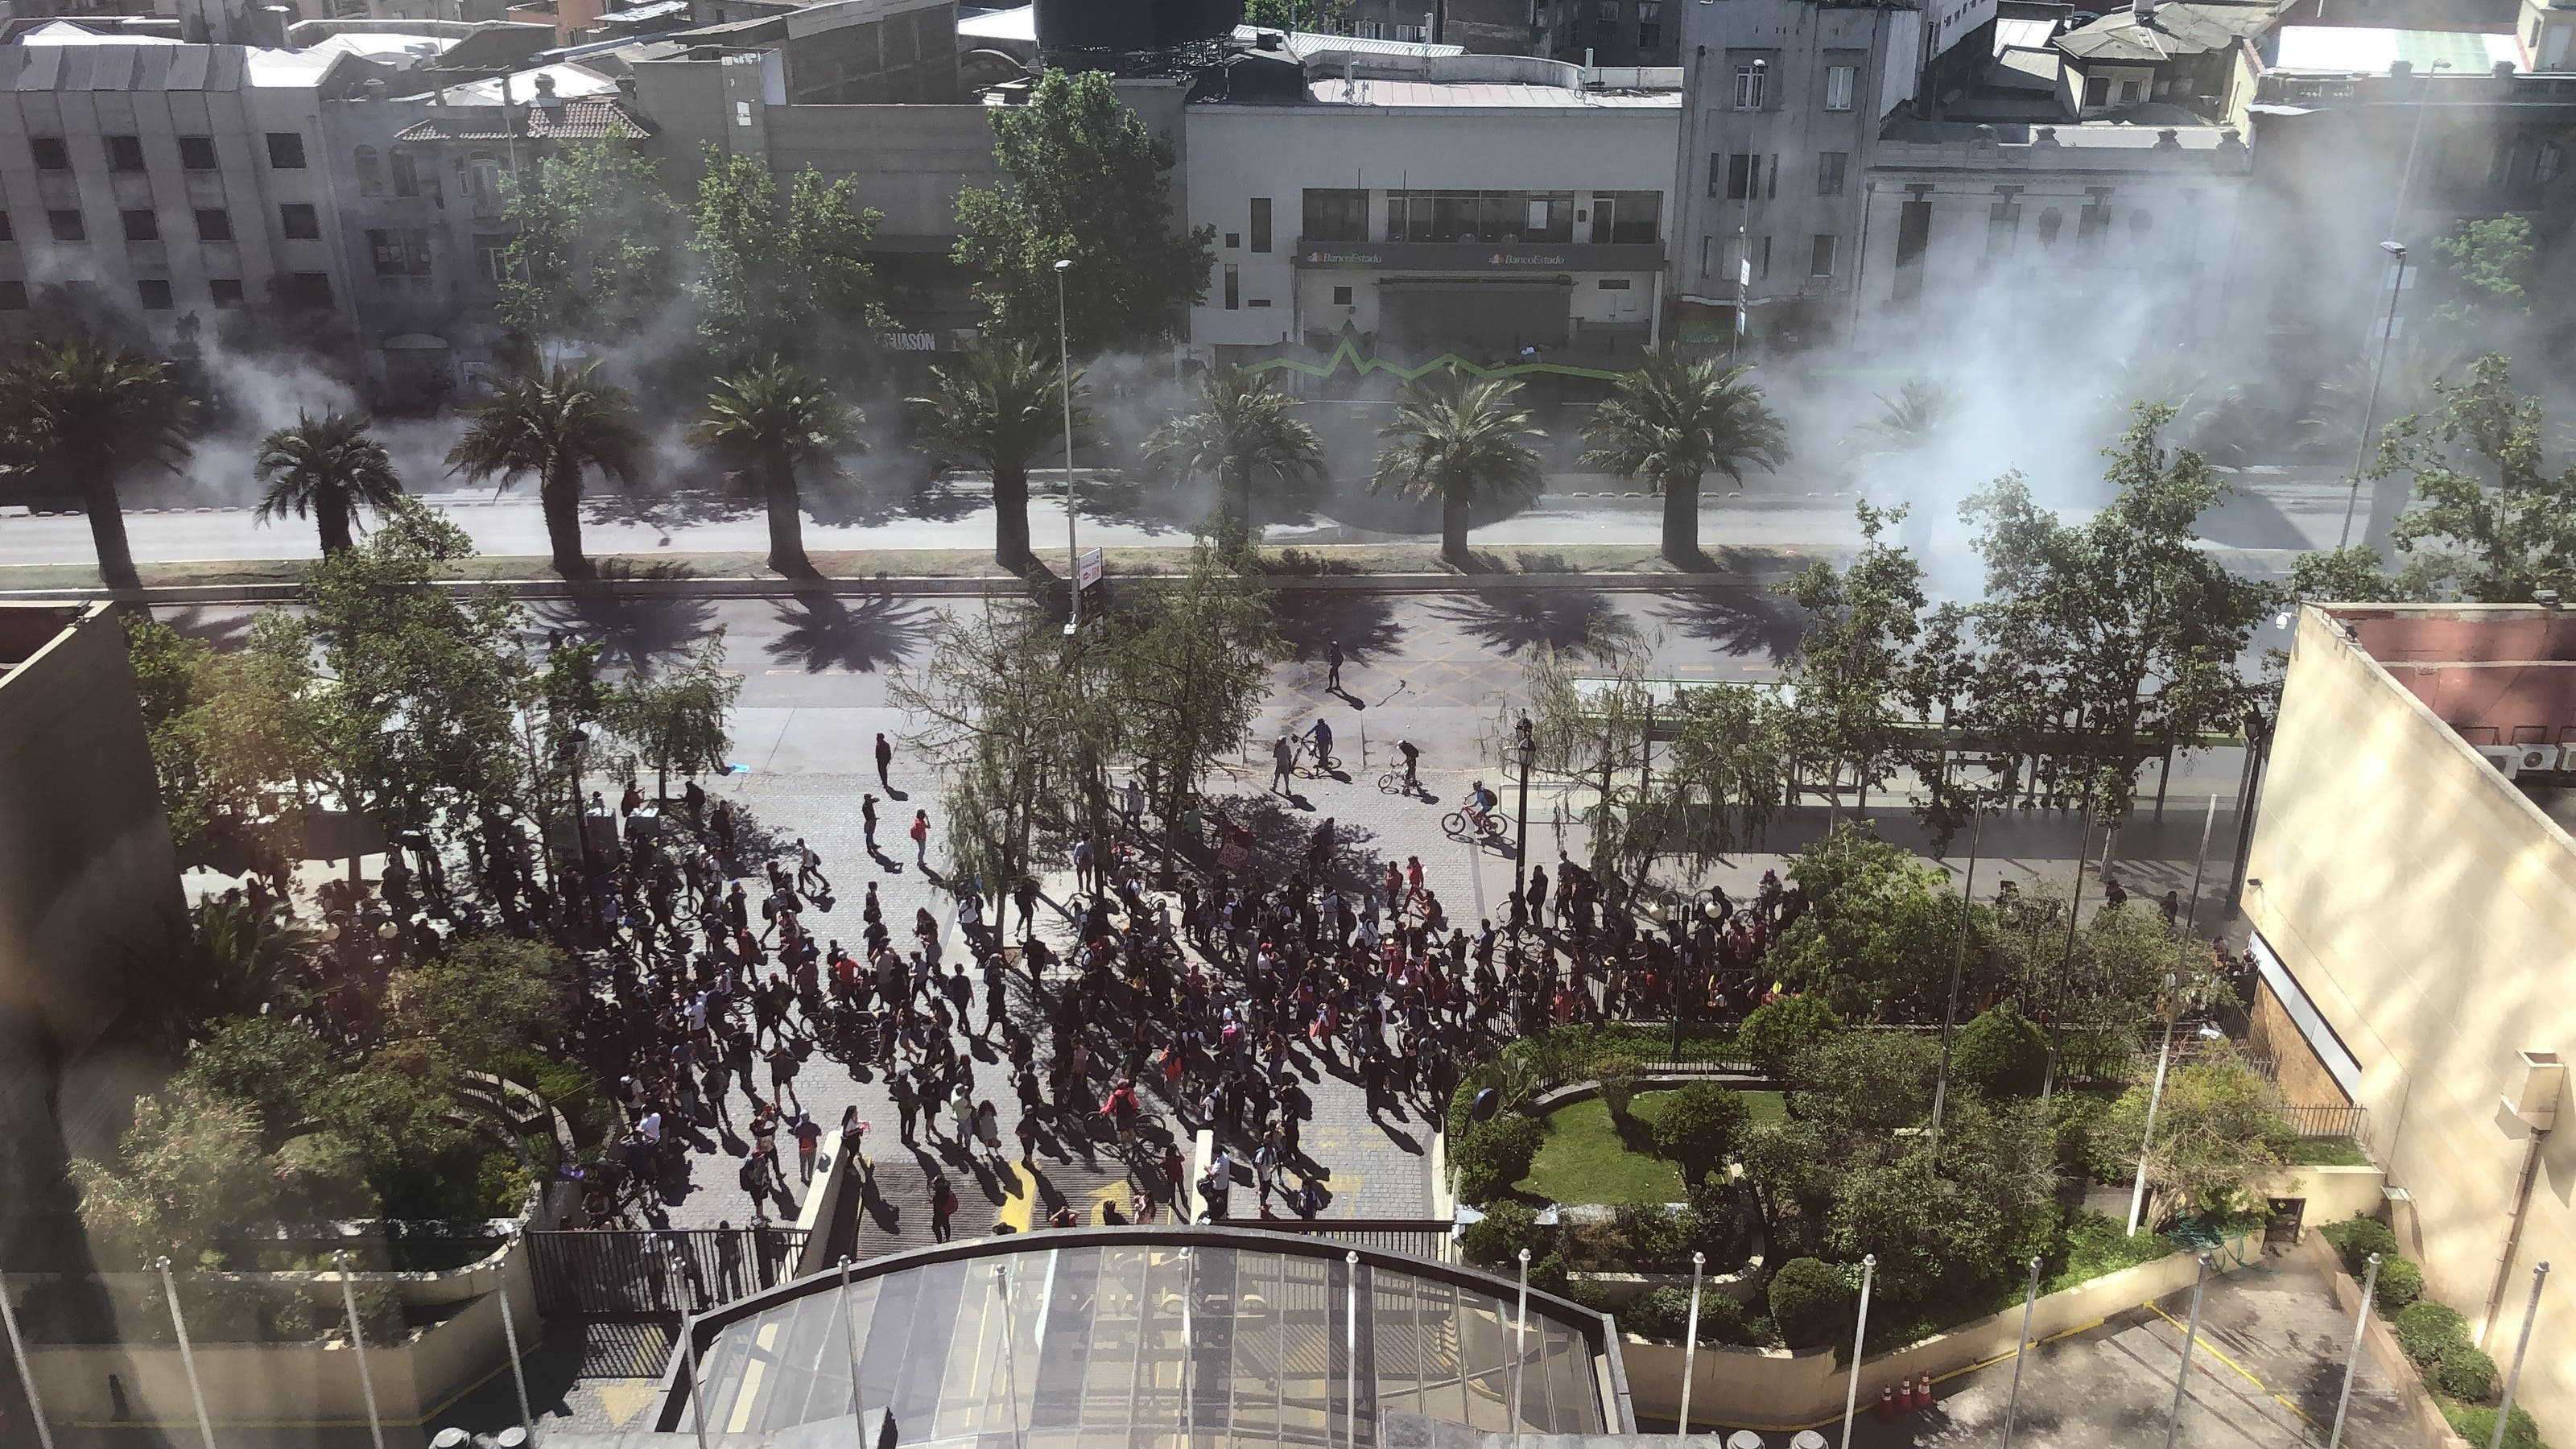 Brugger Karatekas in Chile